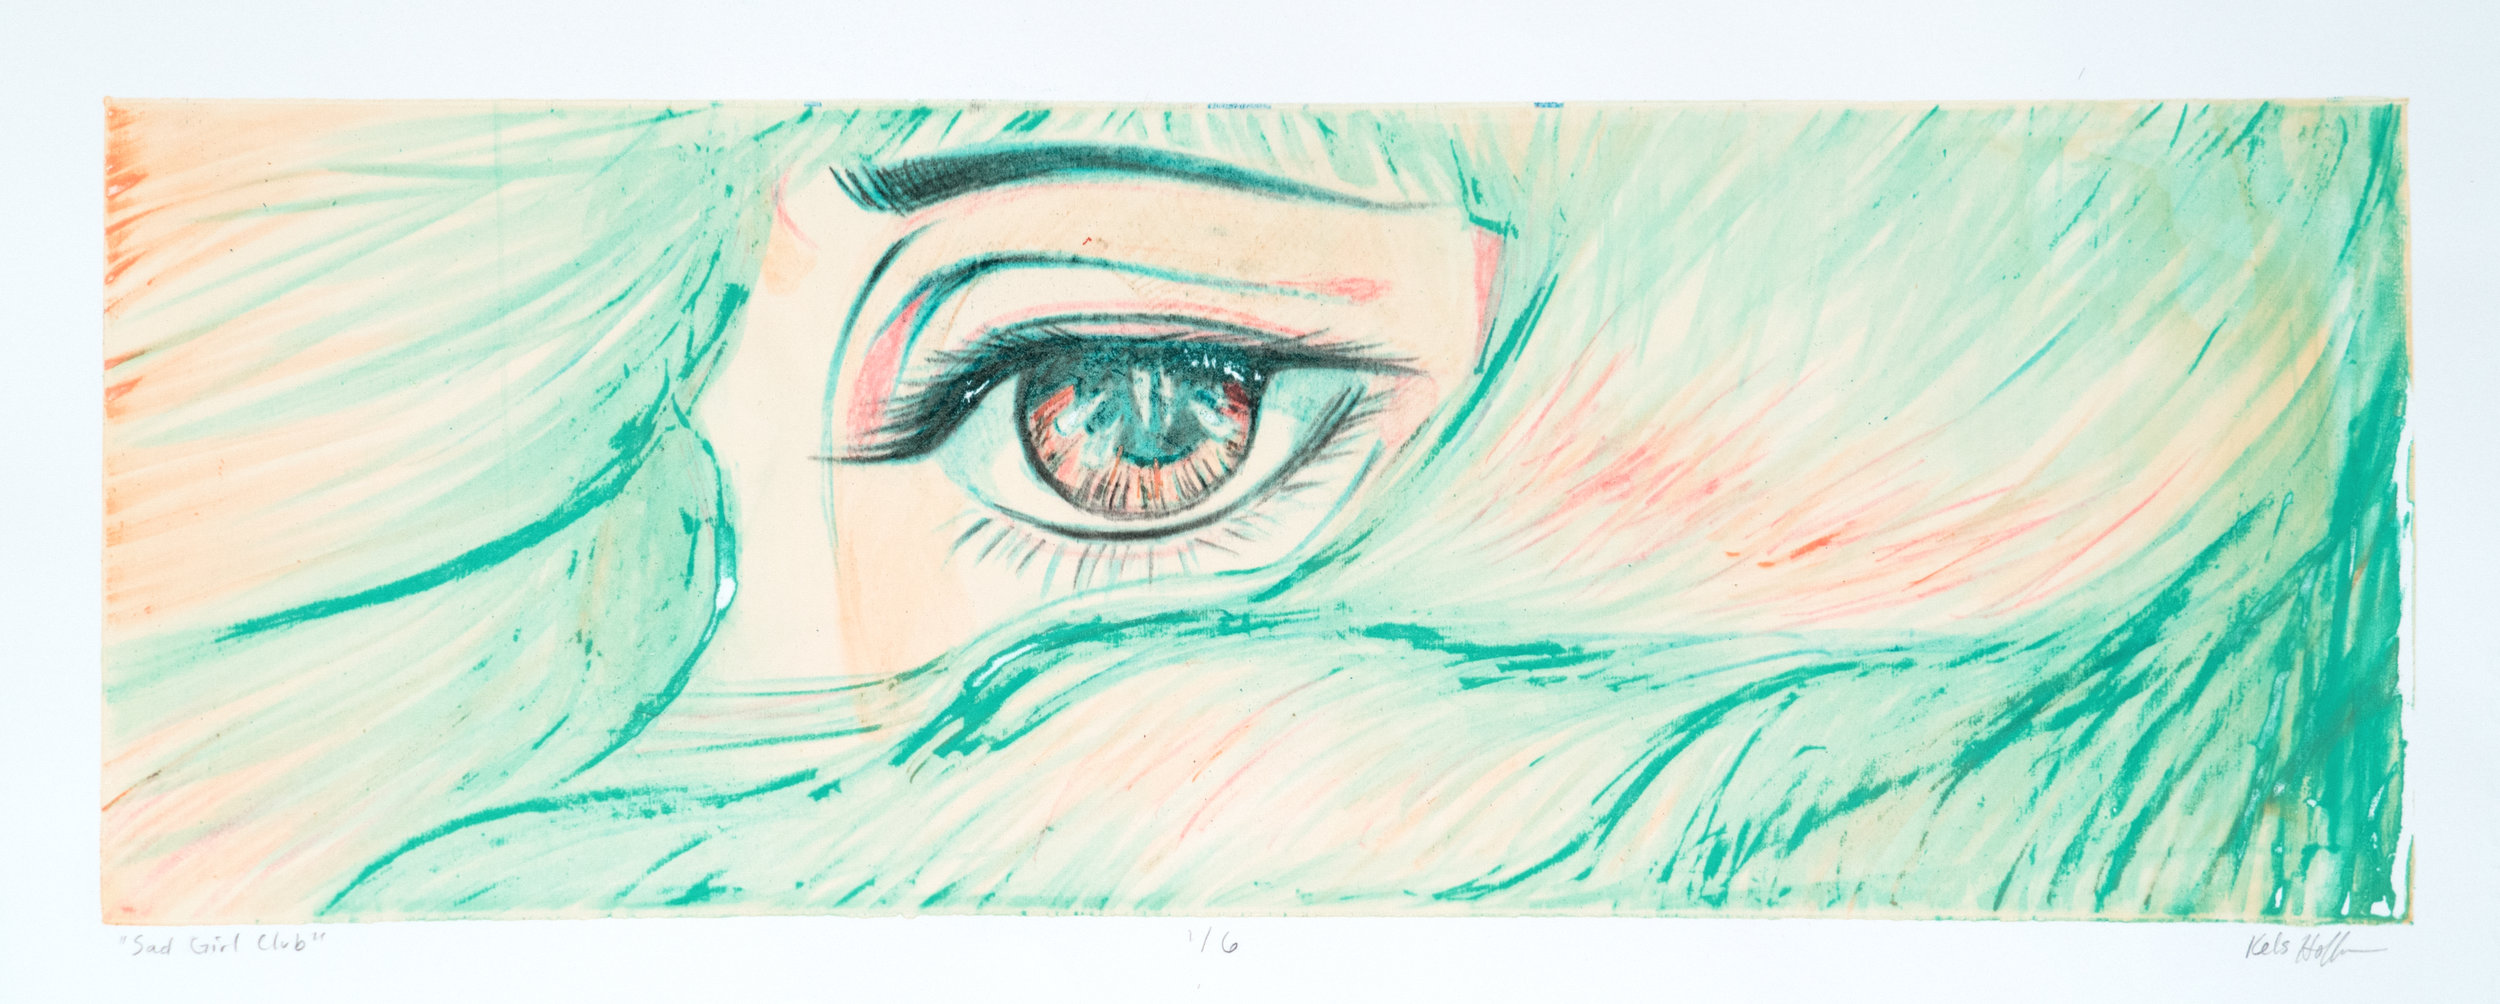 screenprint-sad girl eyes 1.jpg